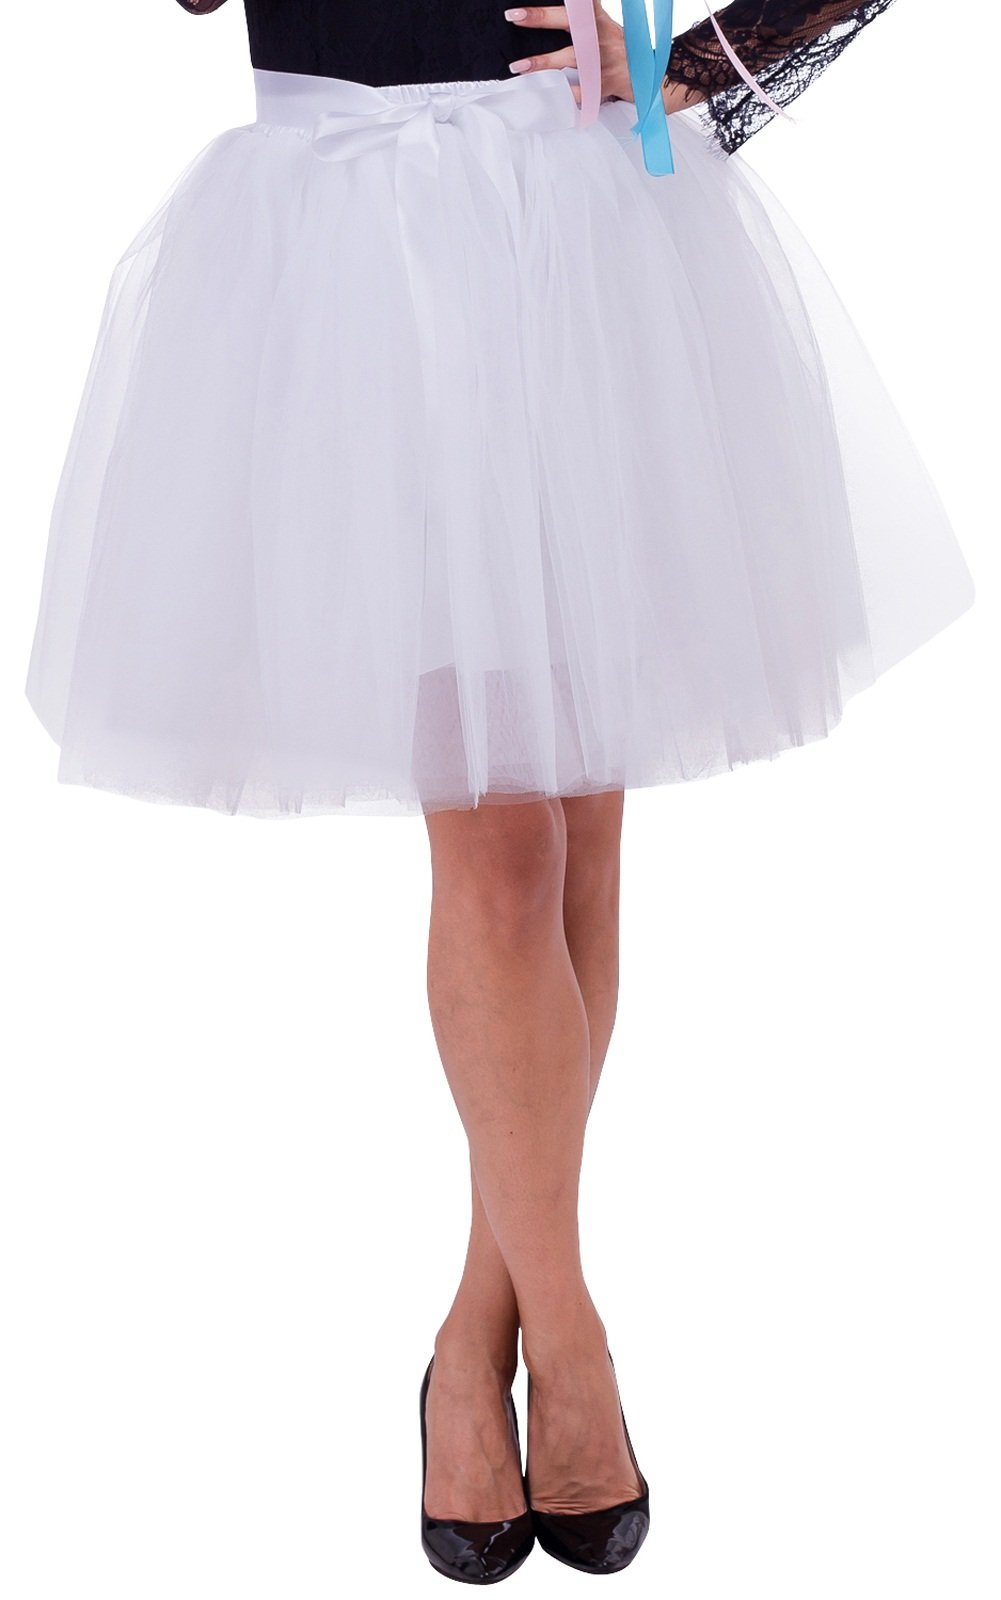 Duraplast Women's Above Knee Skirt Tutu Petticoat High Waist Tulle White,Large